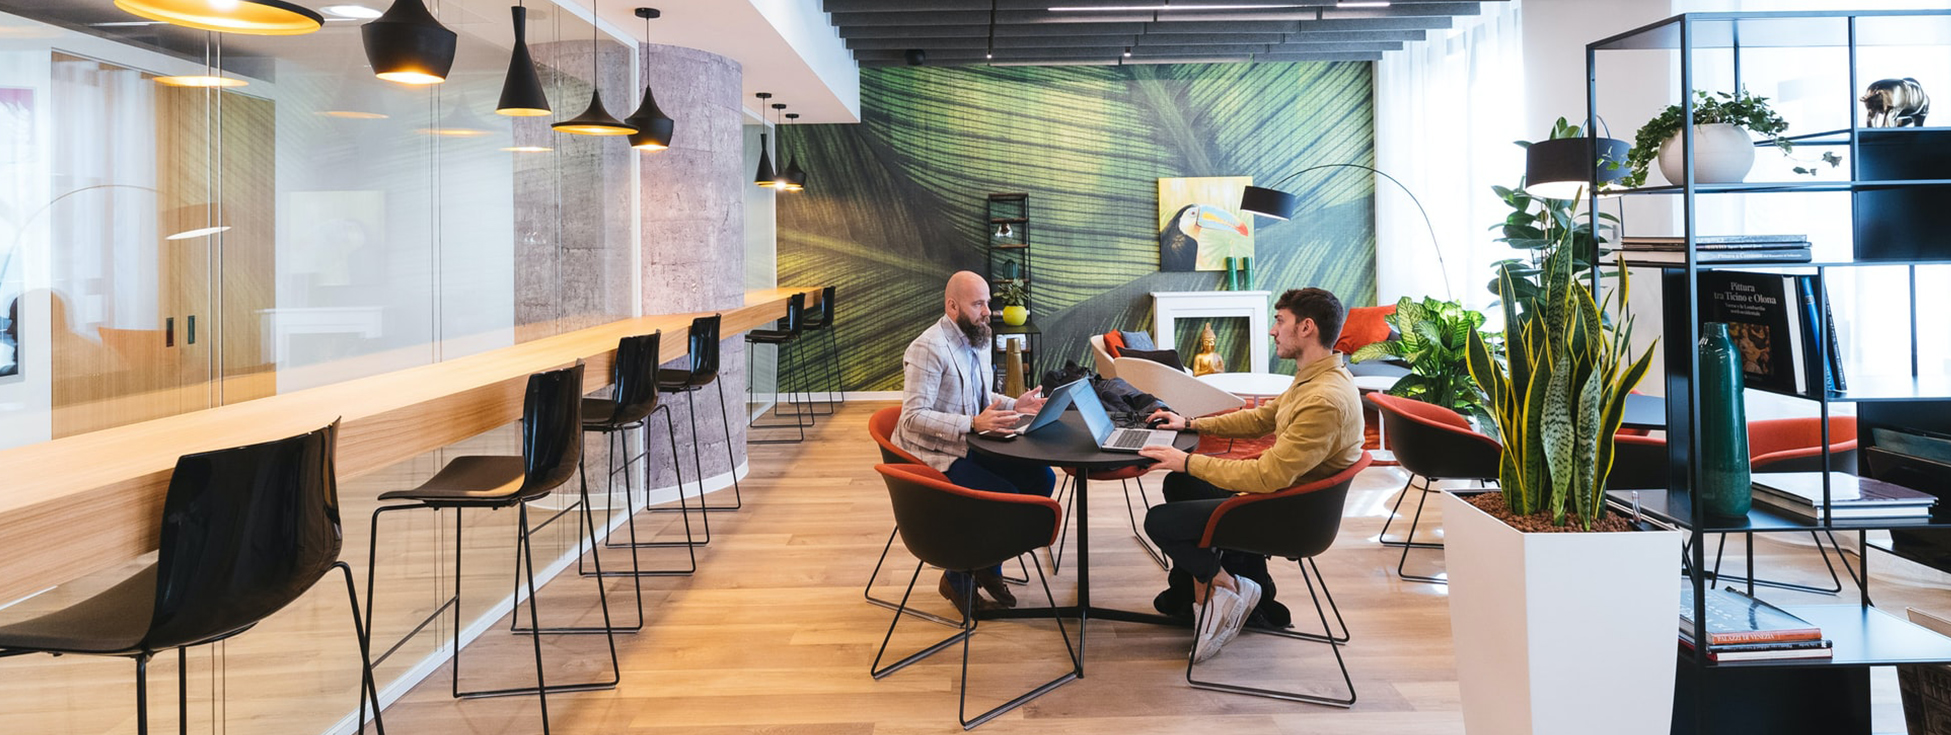 ultrawide-office-meeting-2